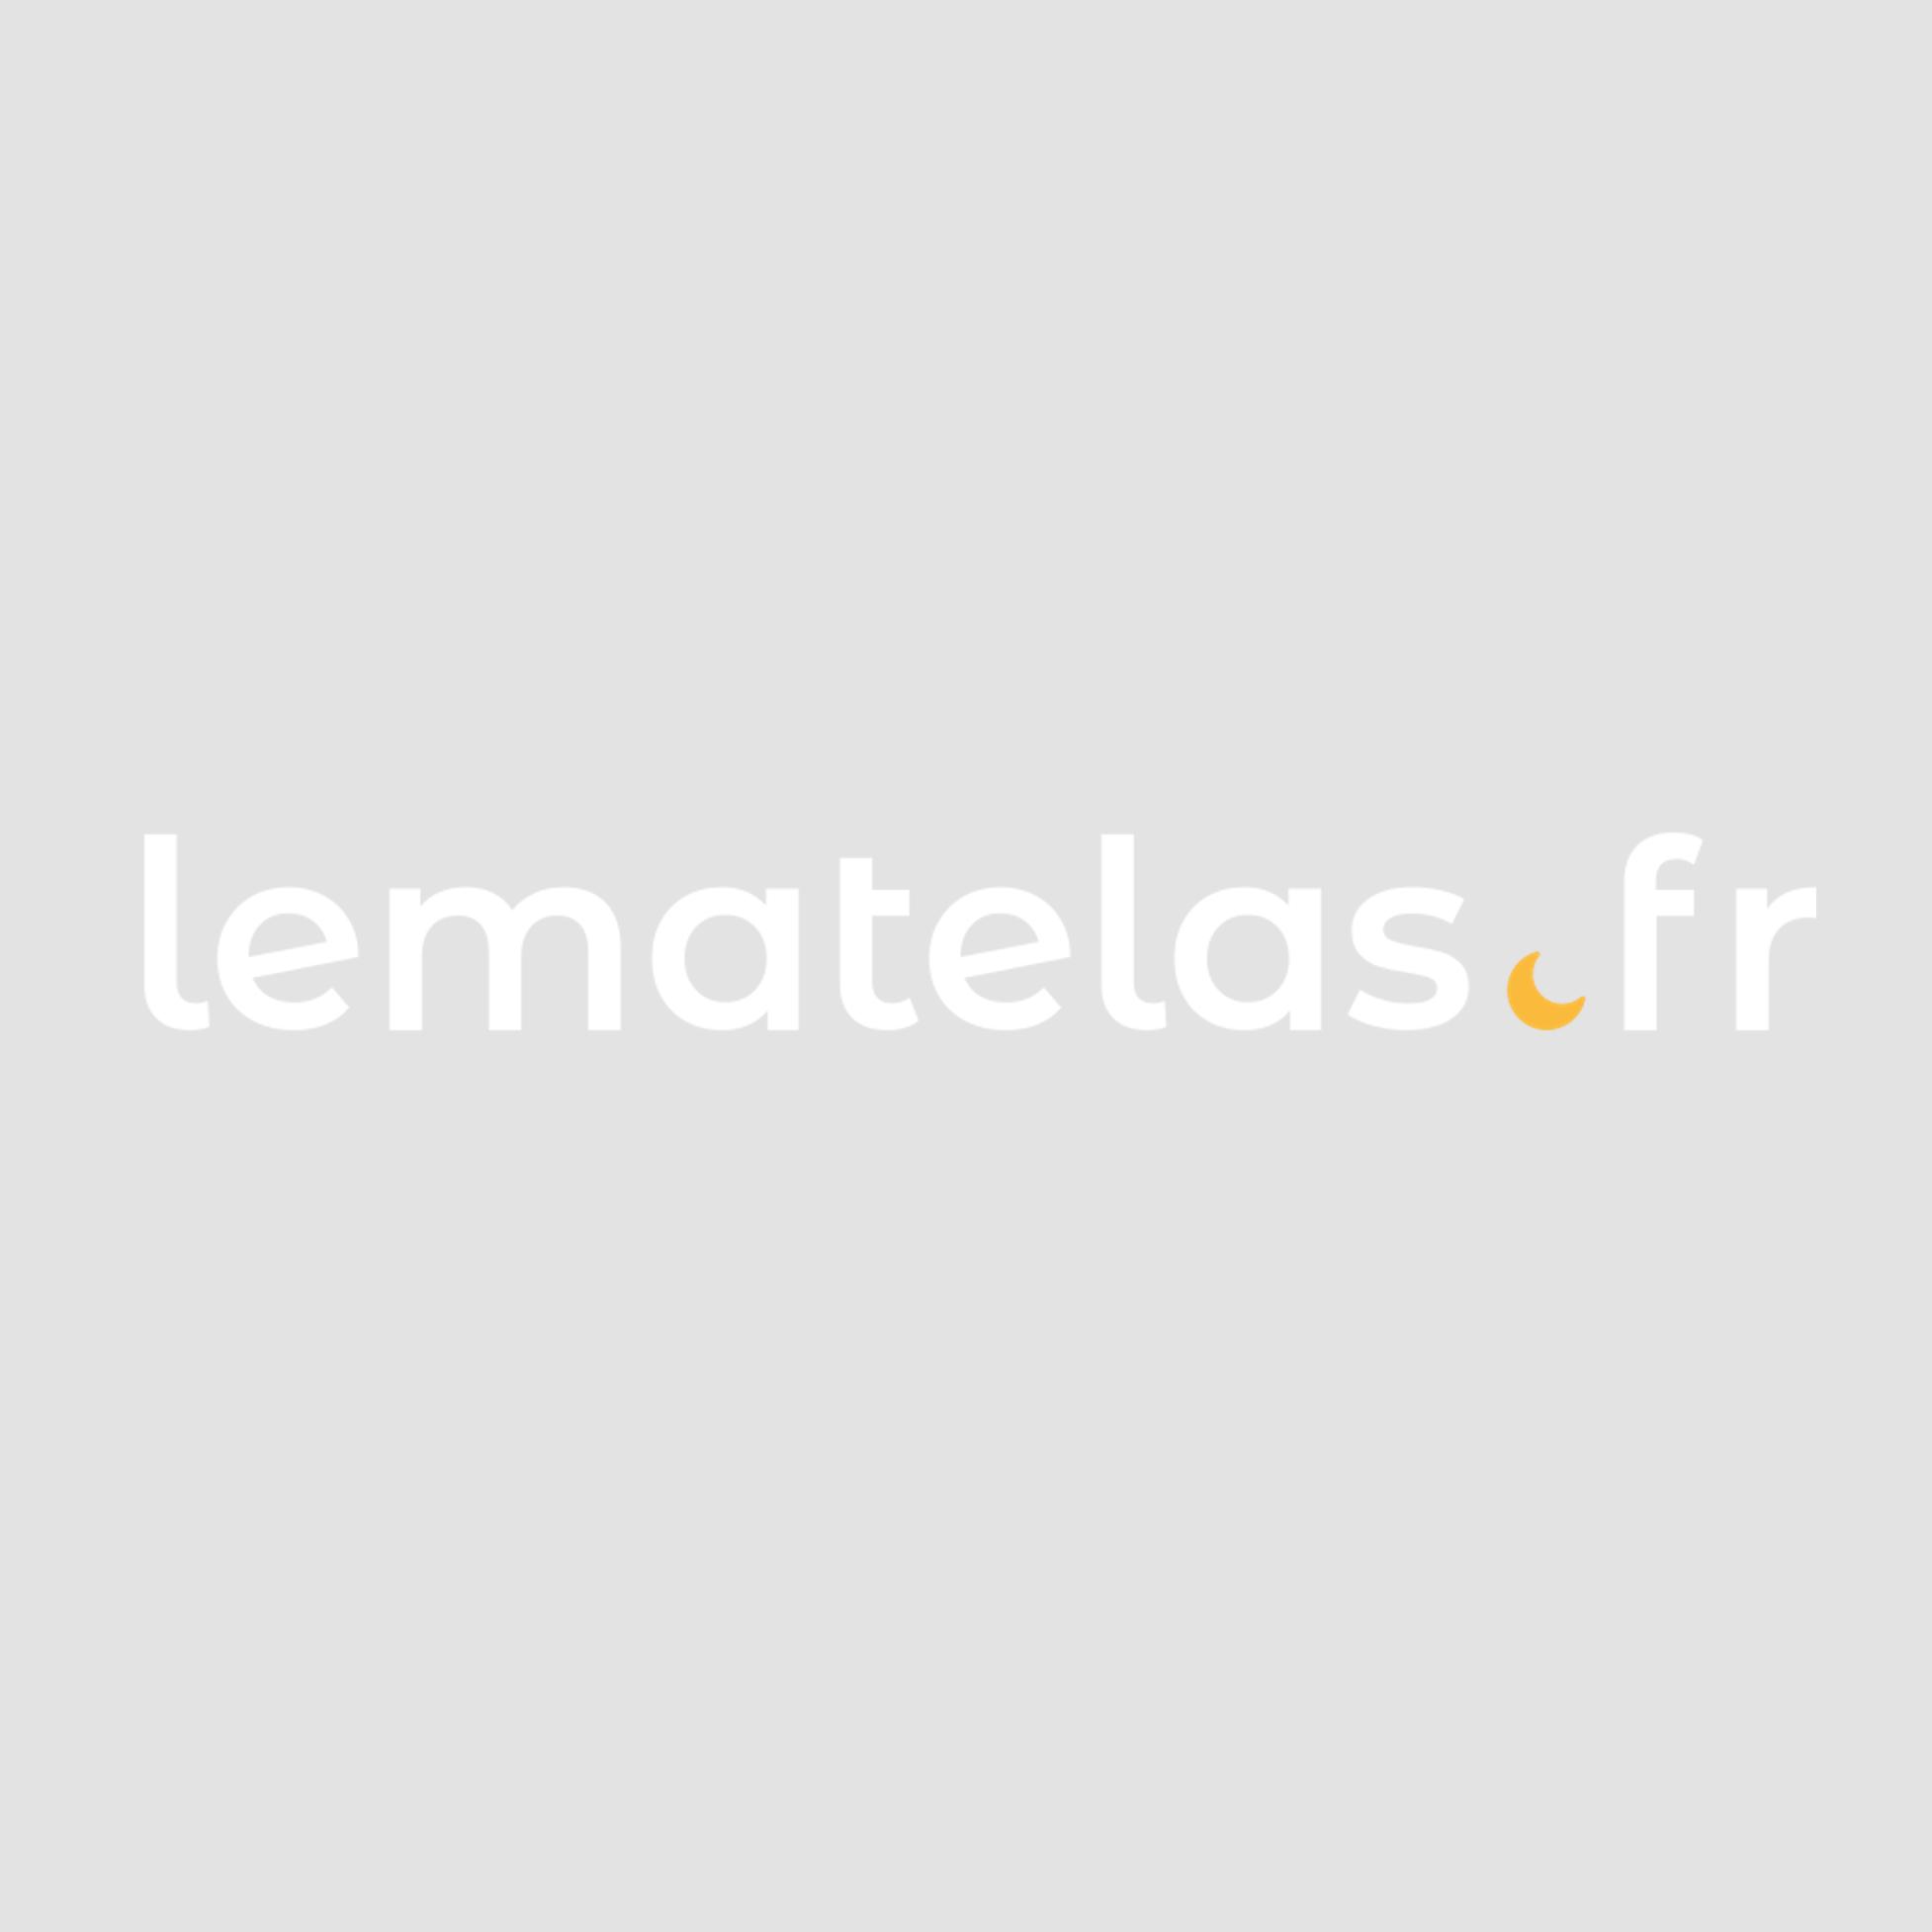 Epeda Drap housse protège matelas imperméable 2 en 1 EPEDA blanc 140x200